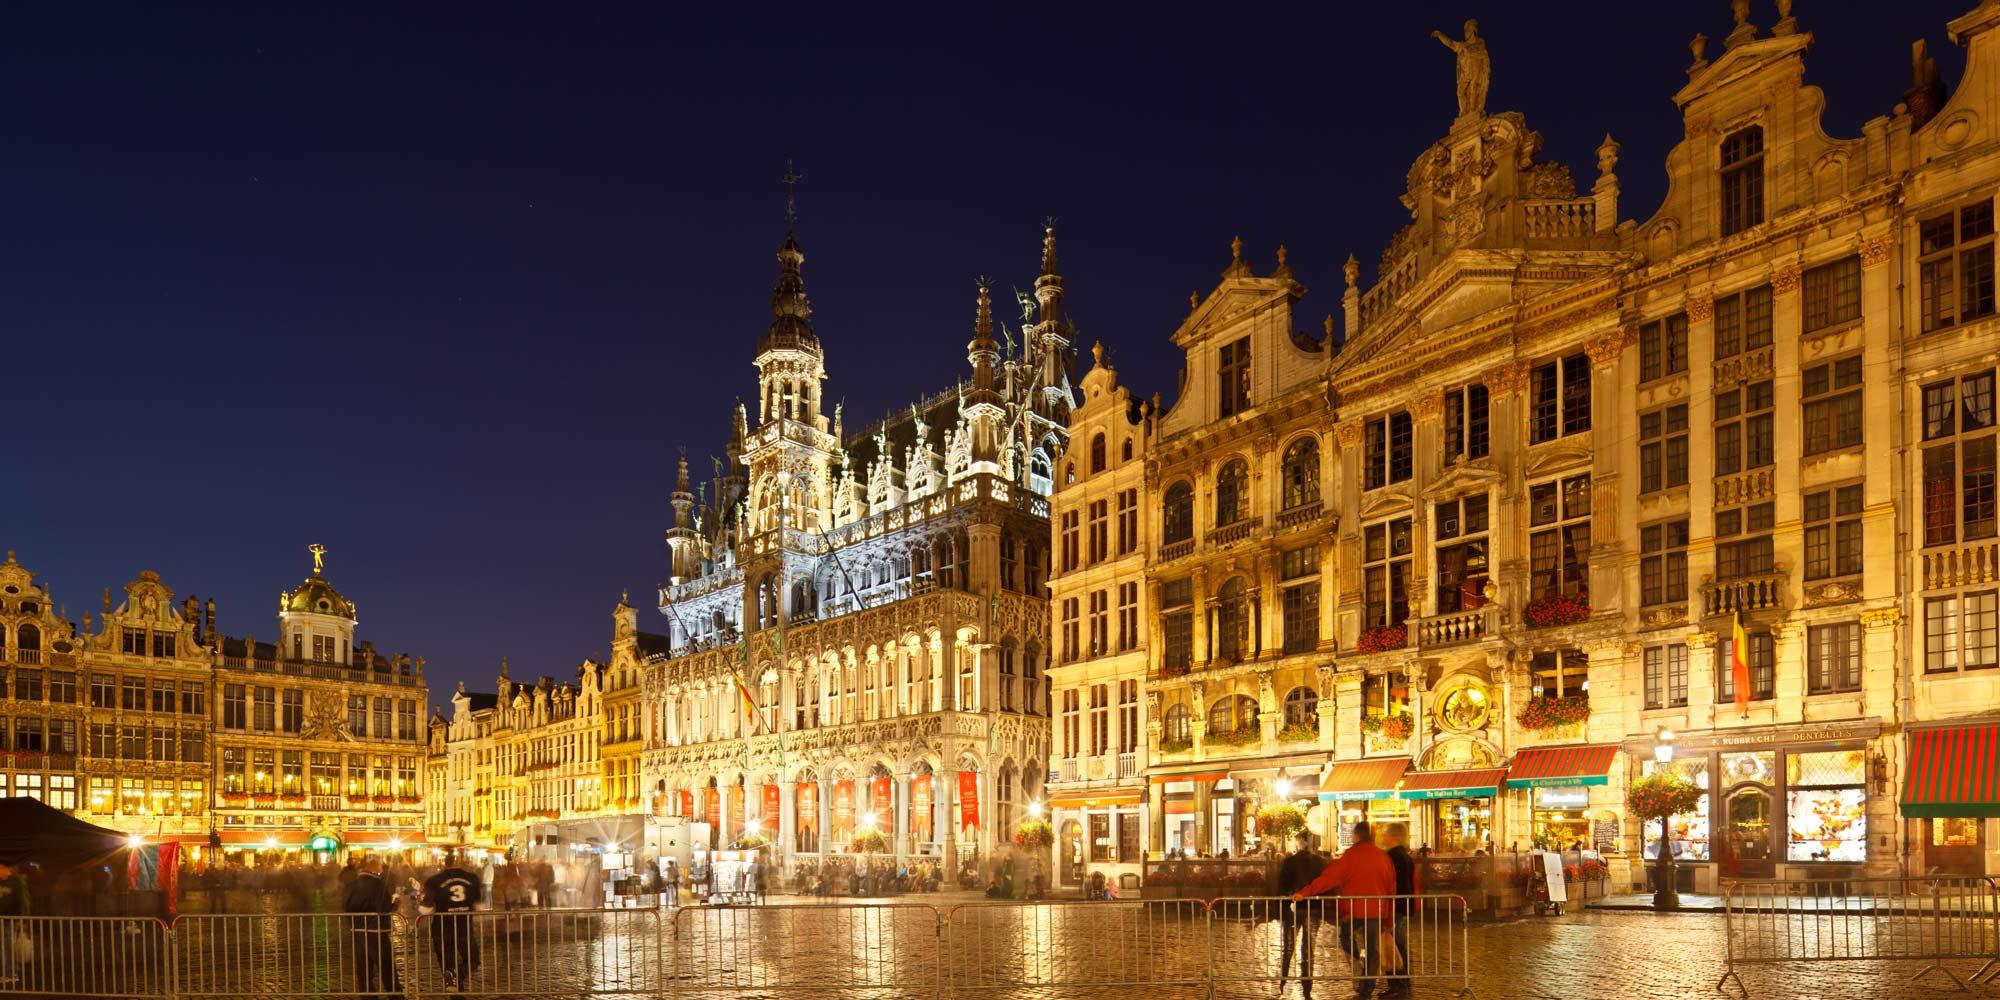 Iphone android ipad web - Dove Si Trova Bruxelles